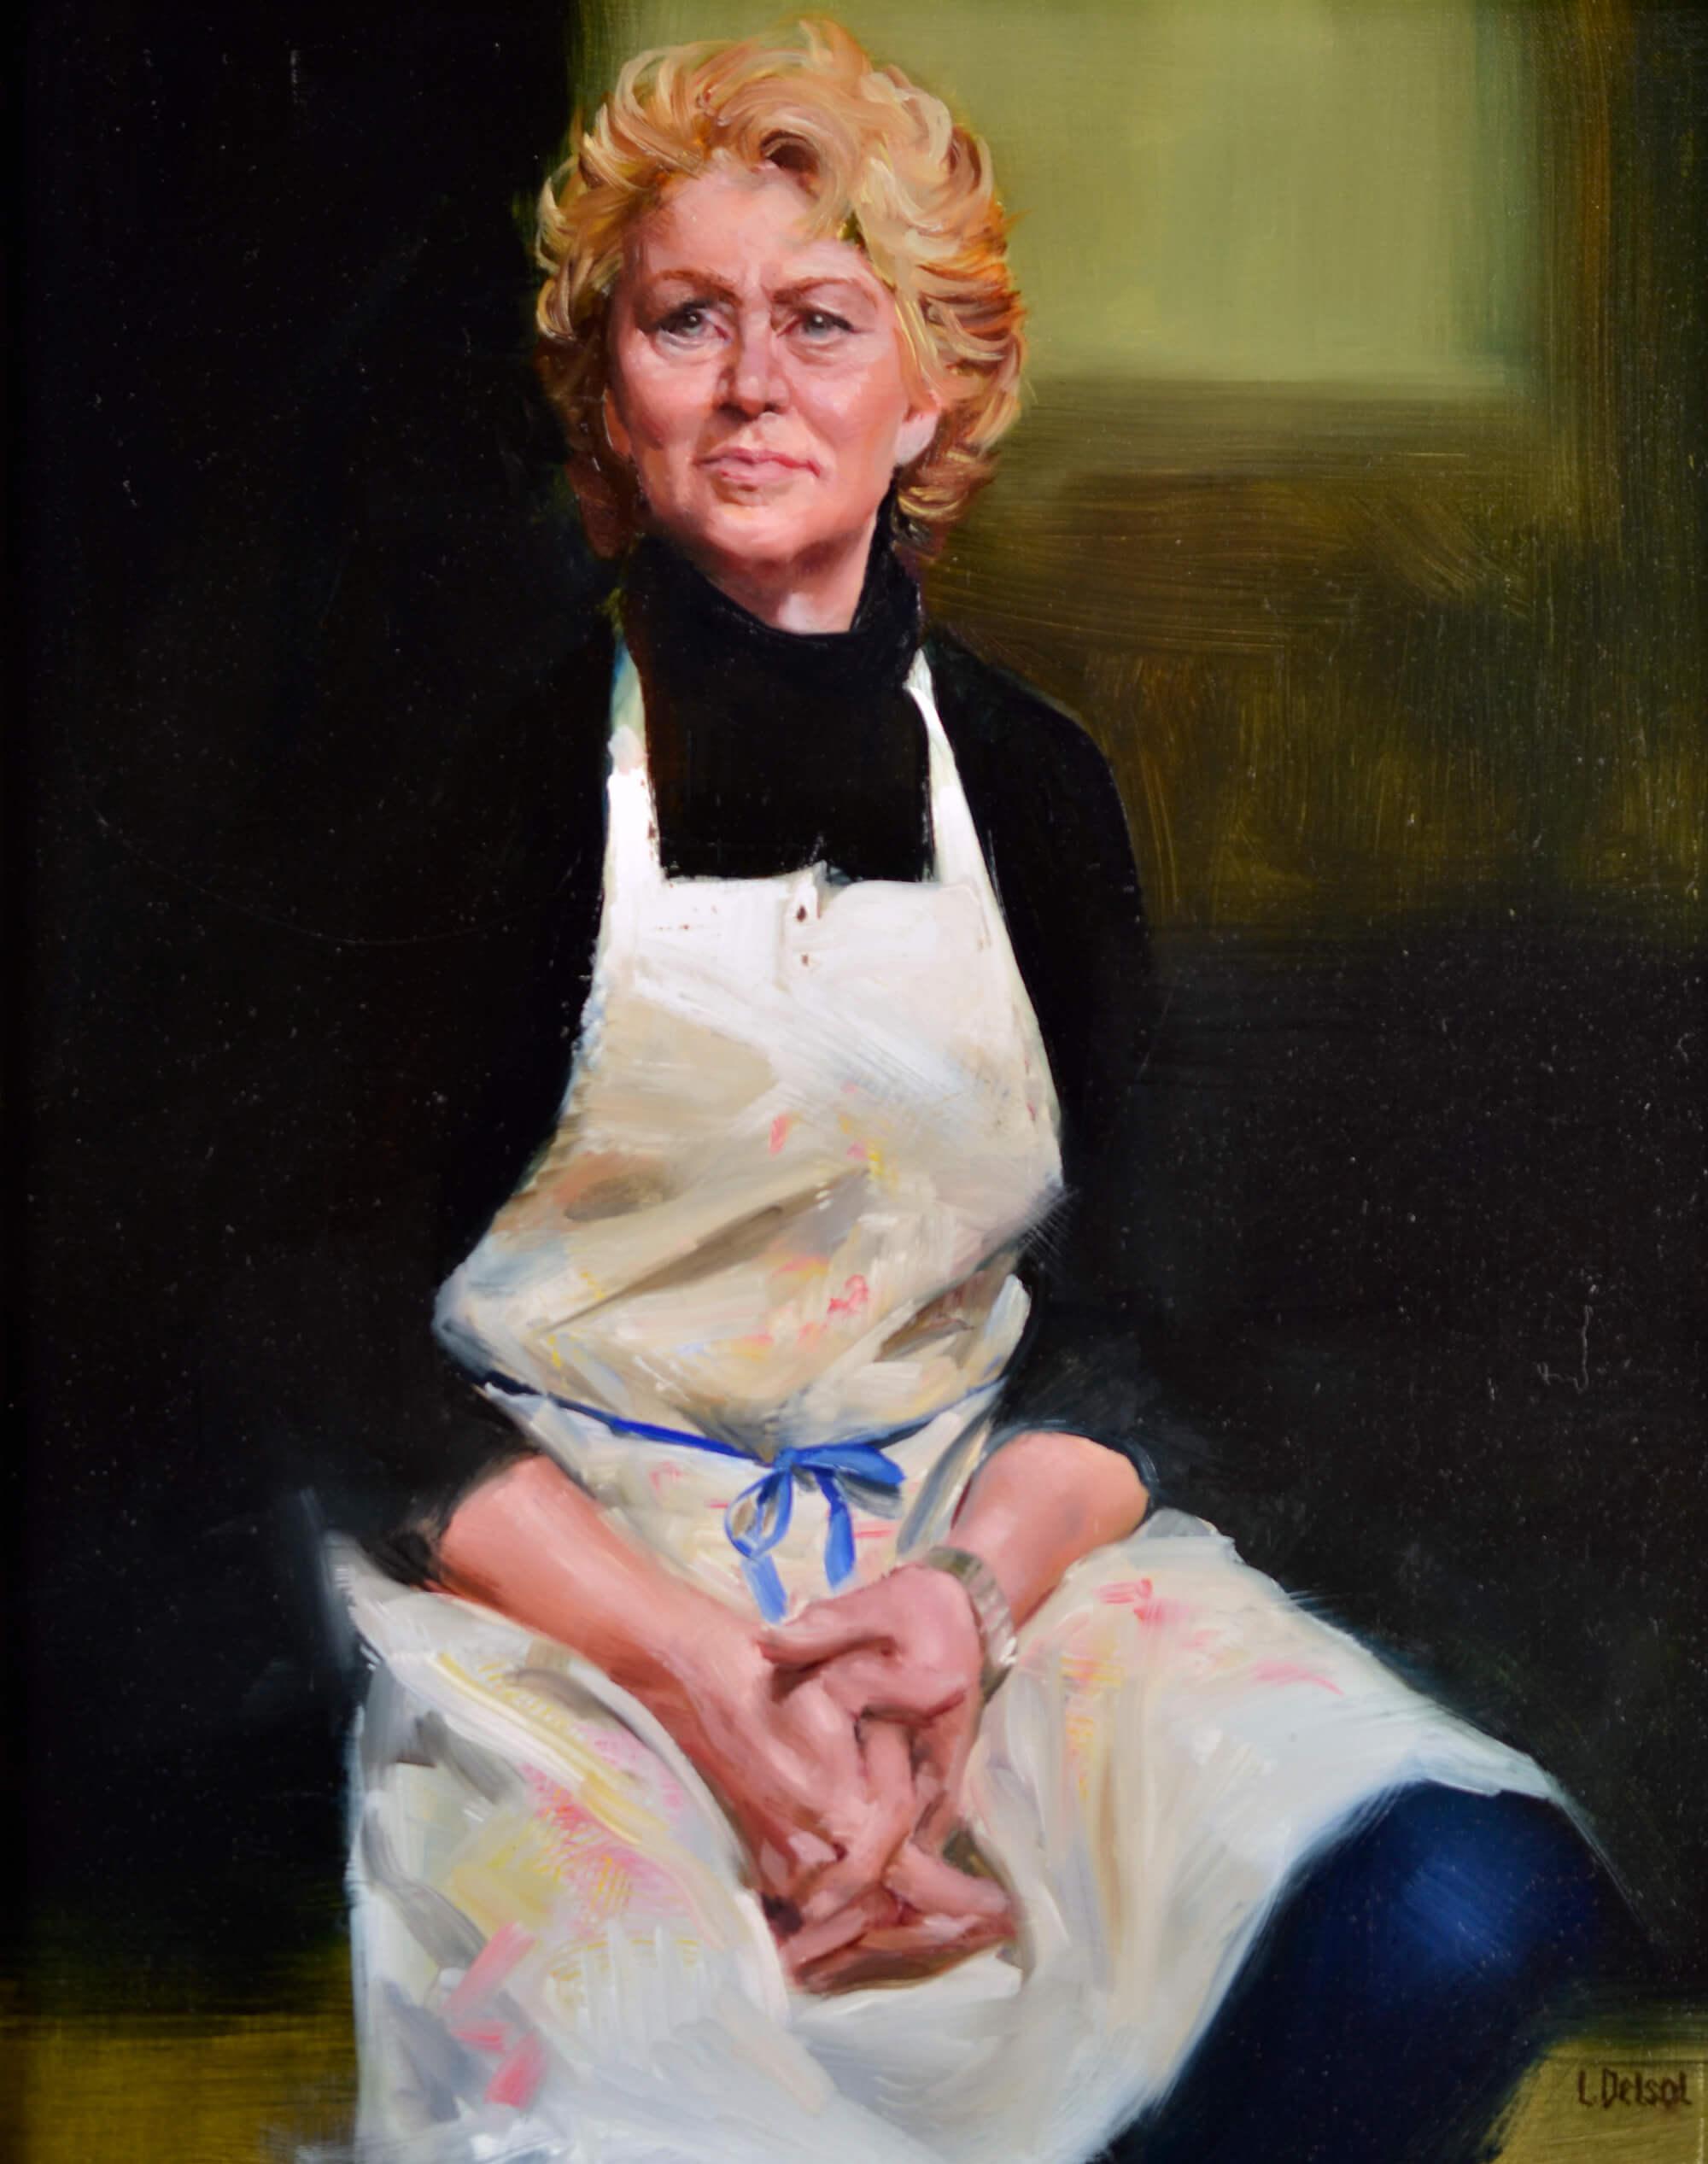 Alla prima oil portrait of a woman artist at the Palette & Chisel wearing a white apron